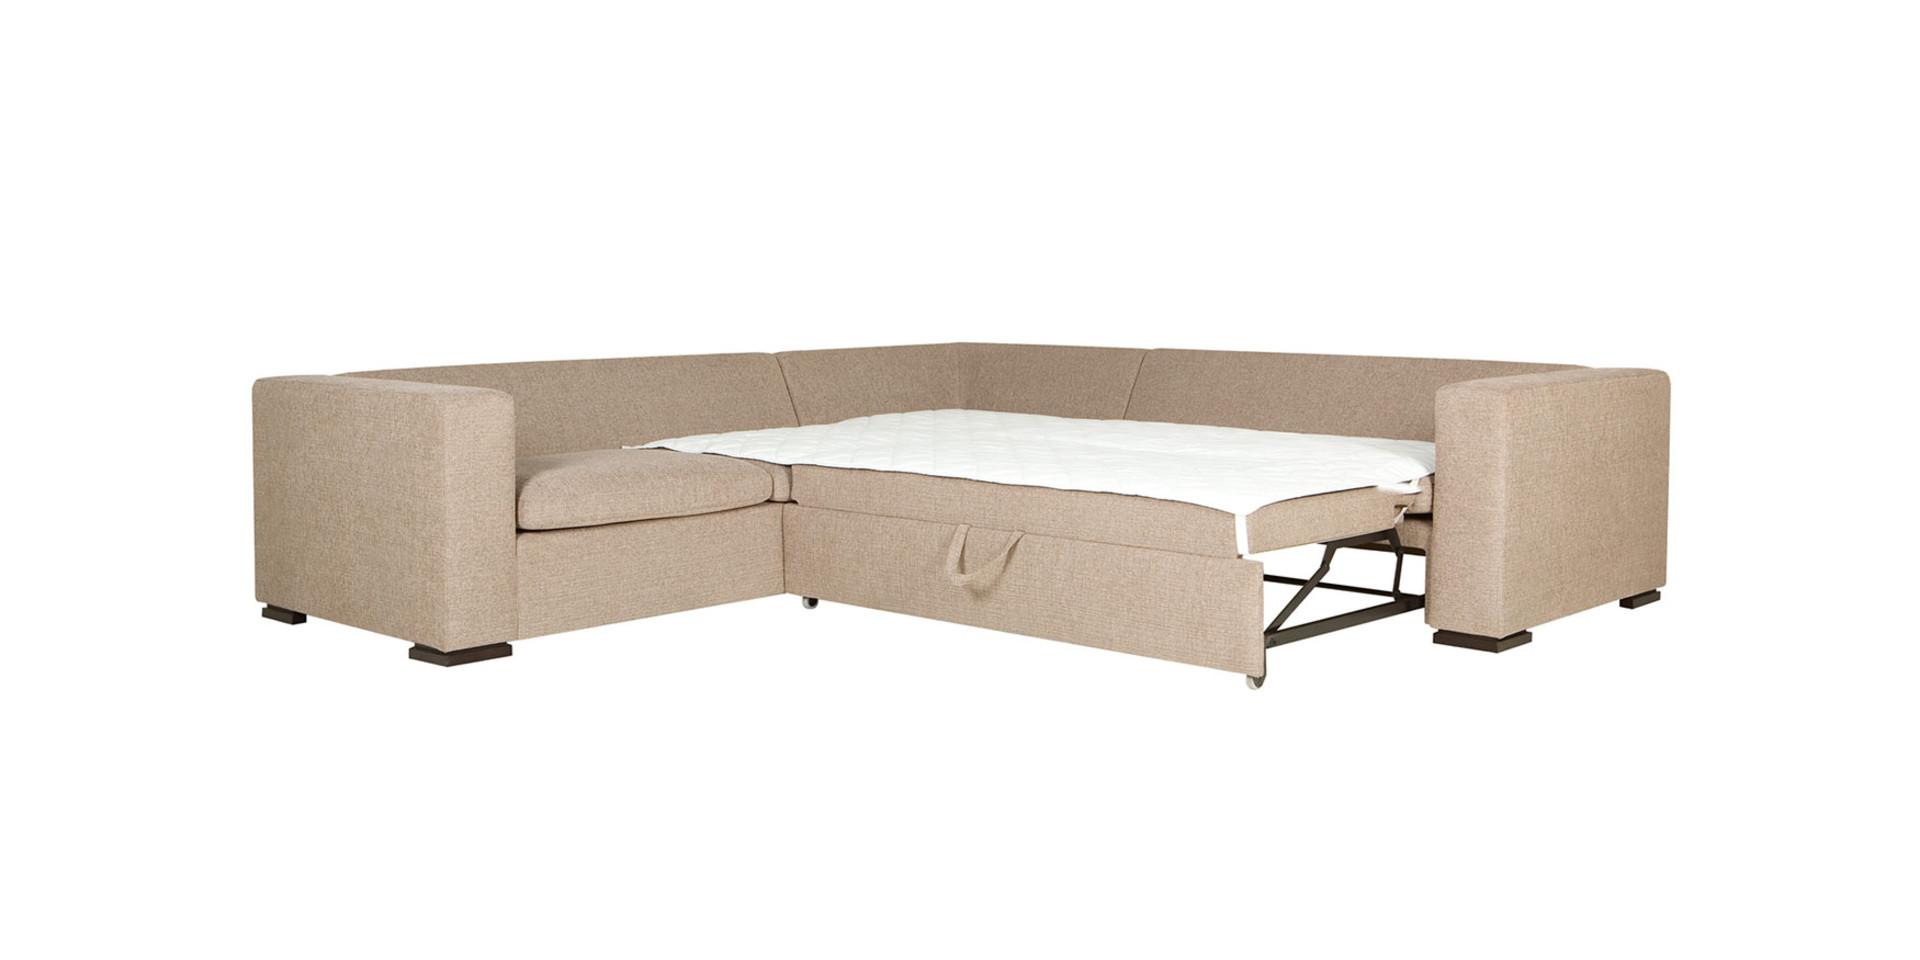 sits-vario-angle-convertible-set9_roxy2_dark_beige_12